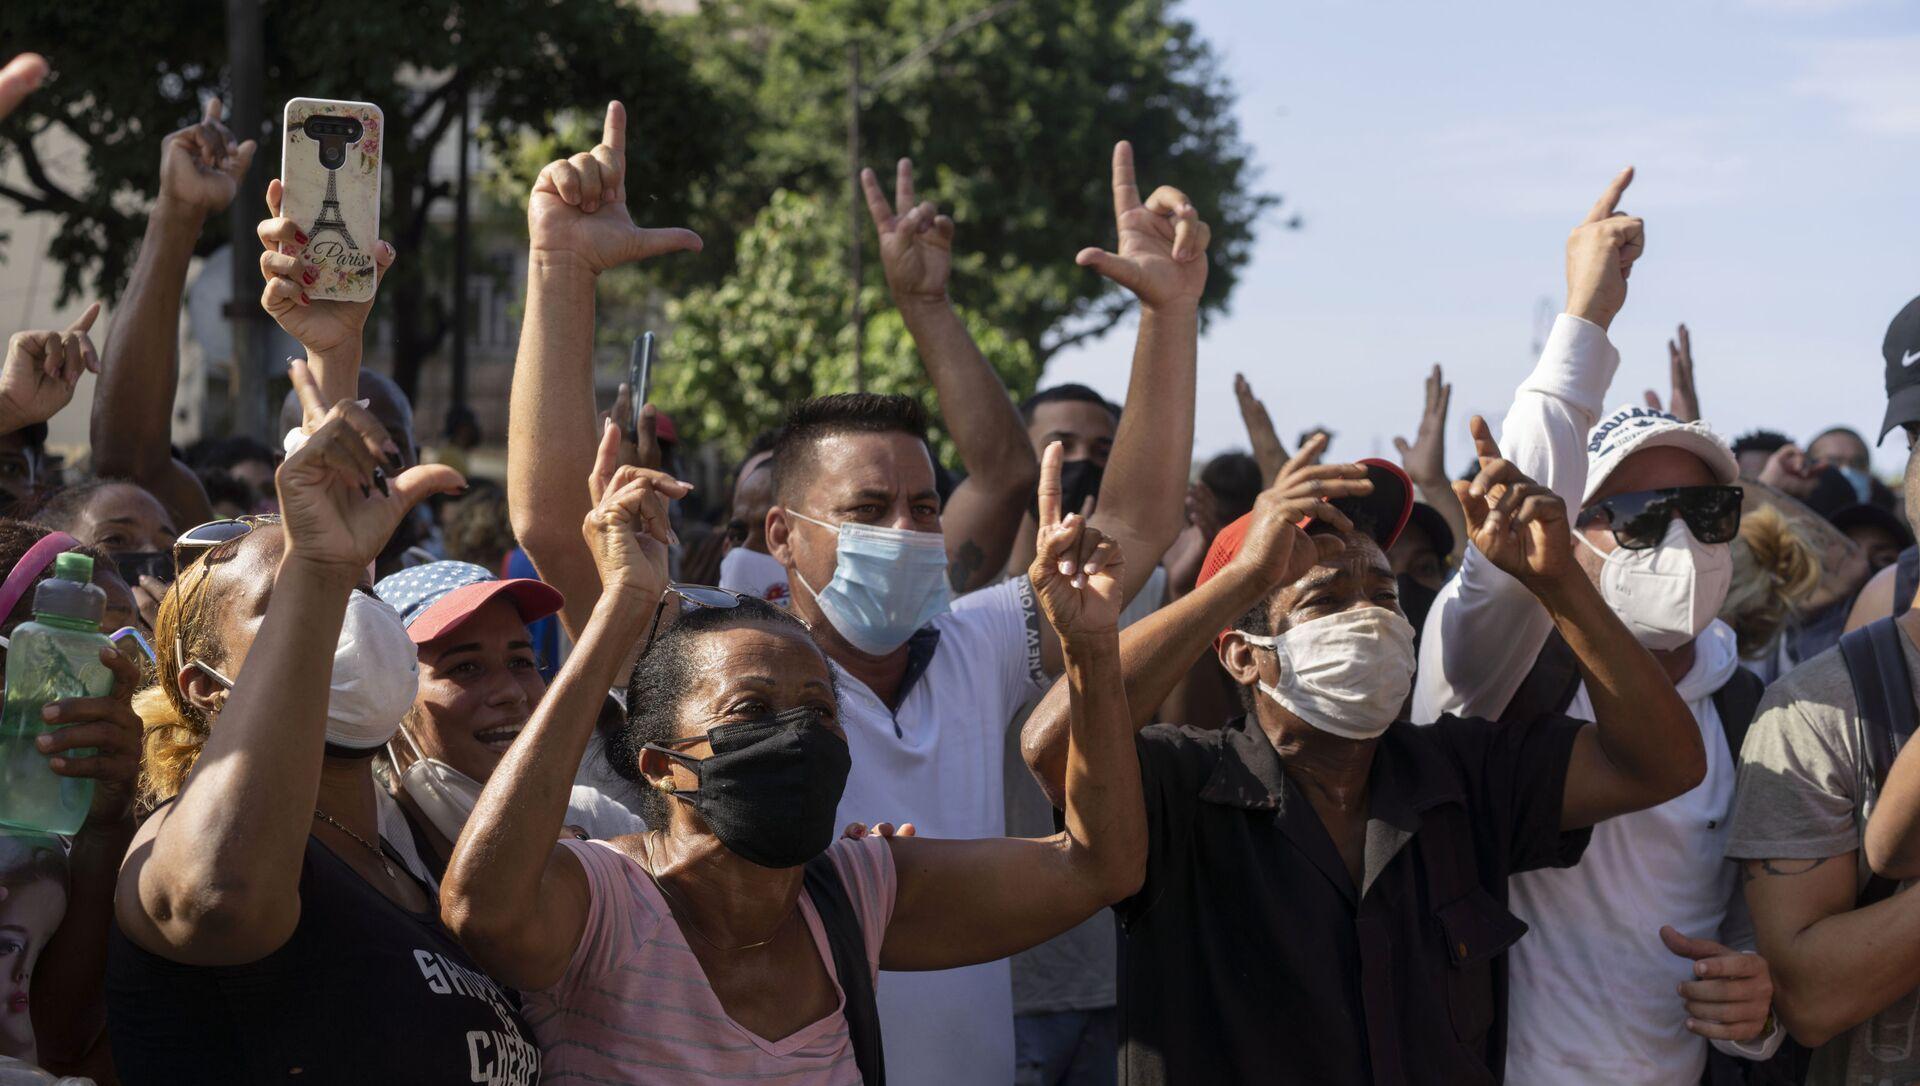 Anti-government protesters march in Havana, Cuba, Sunday, 11 July 2021 - Sputnik International, 1920, 28.07.2021